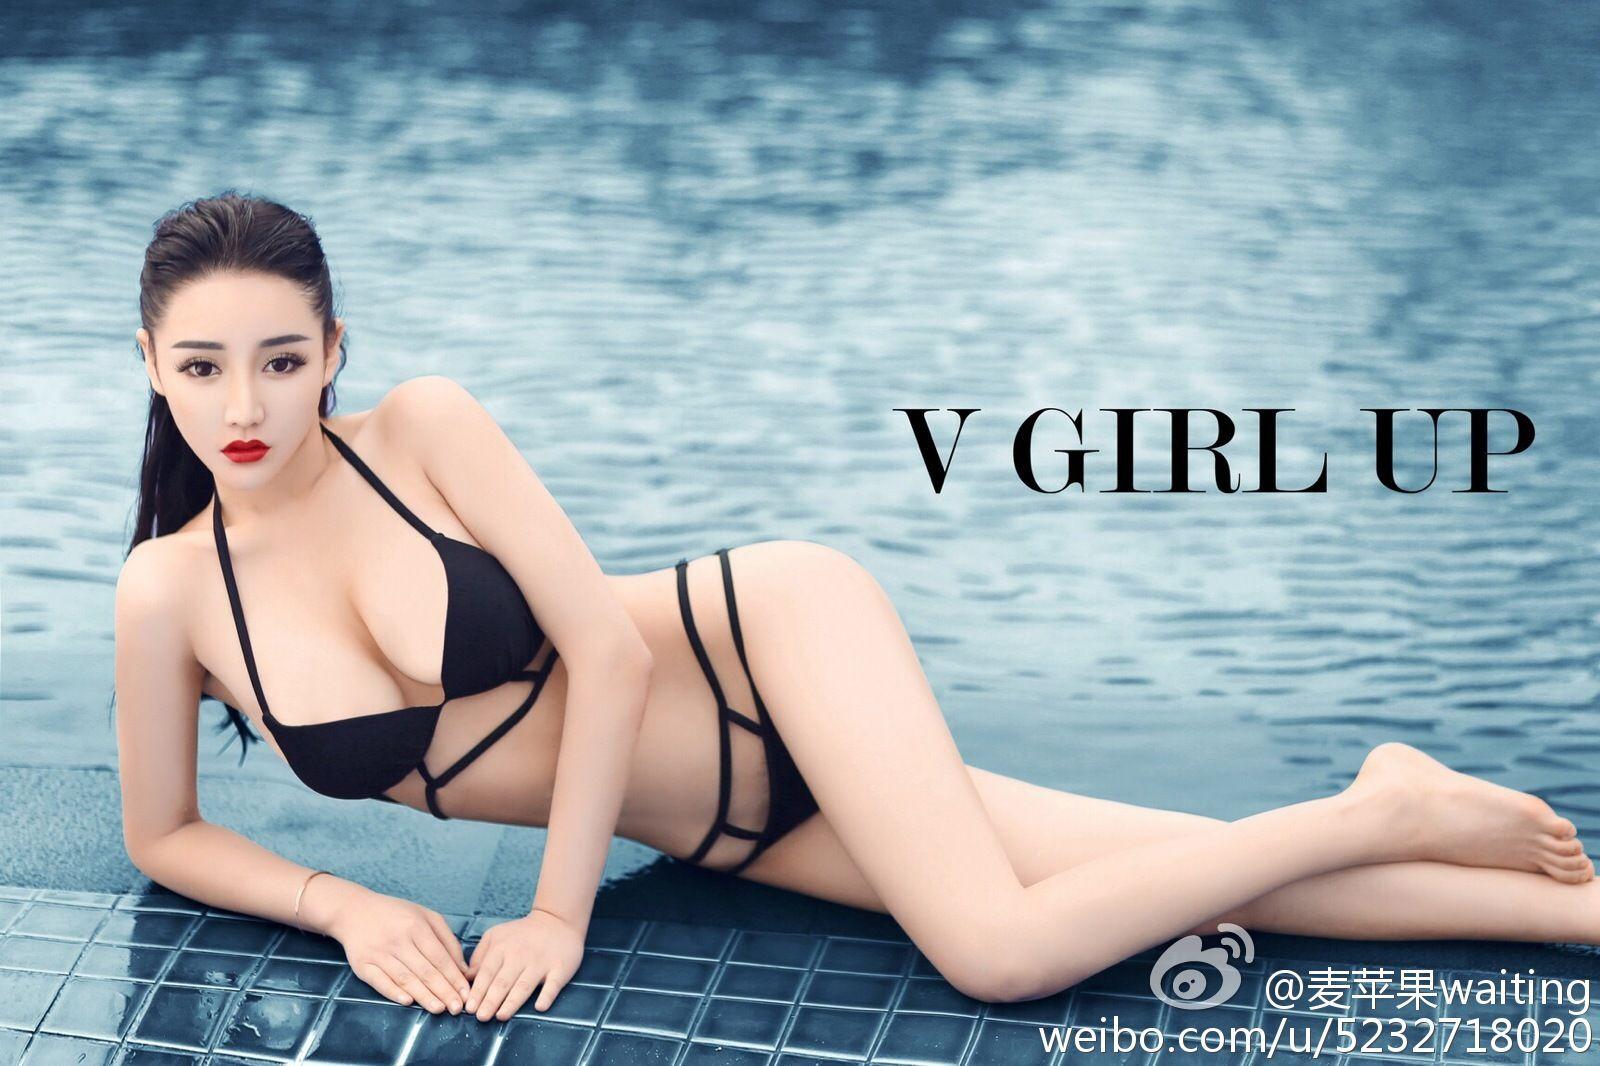 Fotos Mai Ping Guo nude (58 photos), Ass, Bikini, Boobs, cleavage 2018